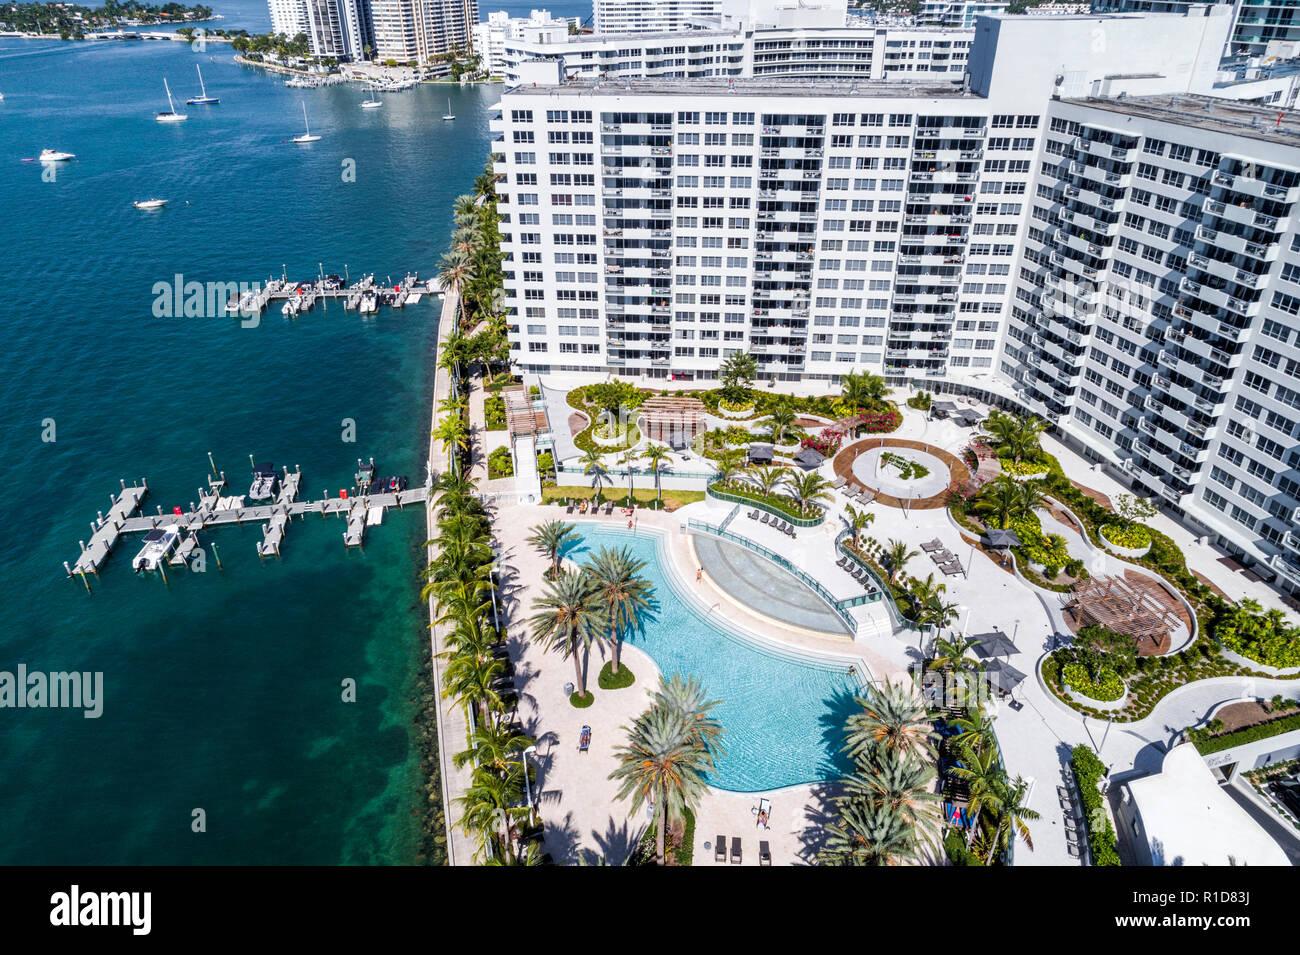 Miami Beach Florida Biscayne Bay aerial overhead bird's eye view above Flamingo South Beach condominium high rise buildings boats water waterfront swi Stock Photo